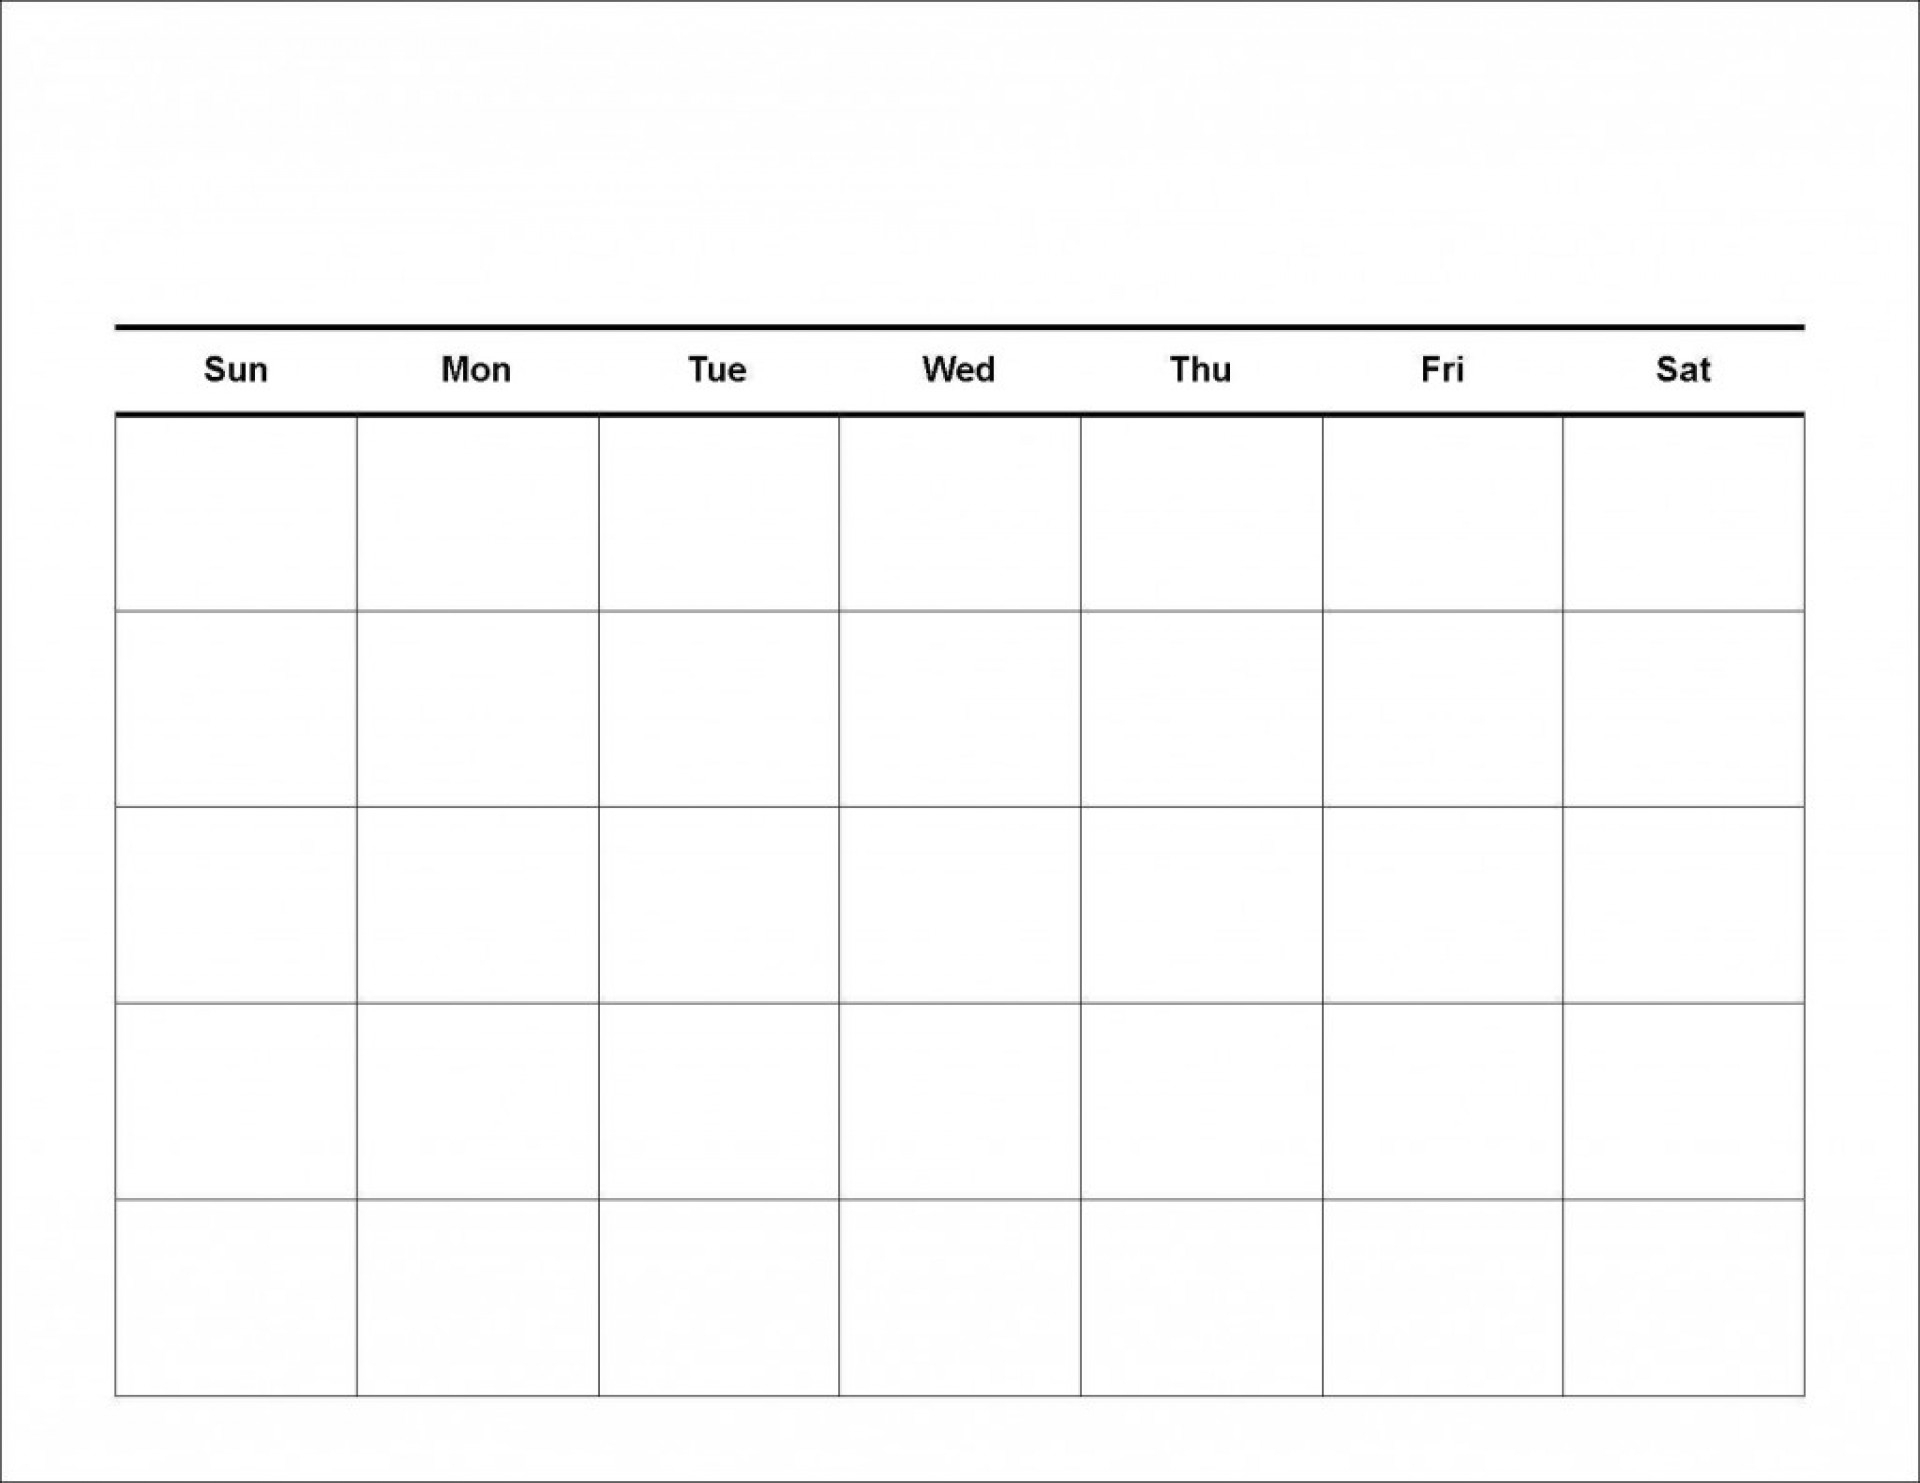 020 Free Blank Calendar Template Ideas 20Blank Weekly Schedule throughout 5 Day Week Blank Calendar With Time Slots Printable